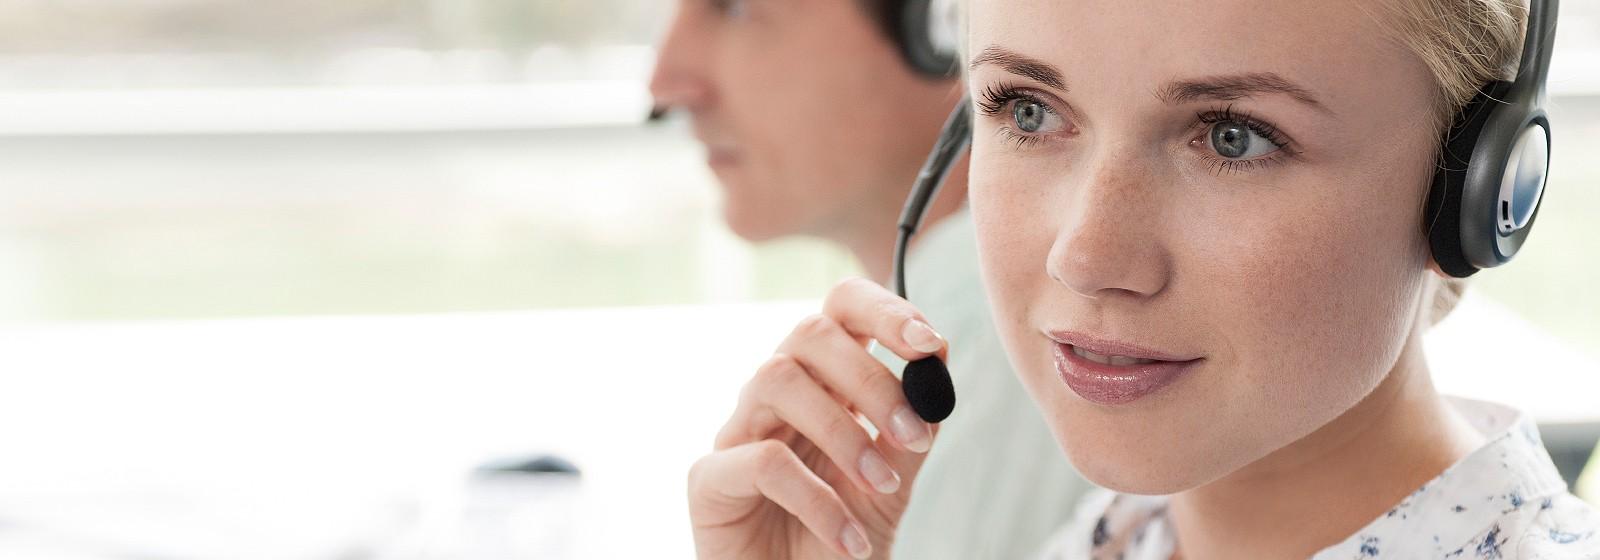 Service Buderus - Call Center